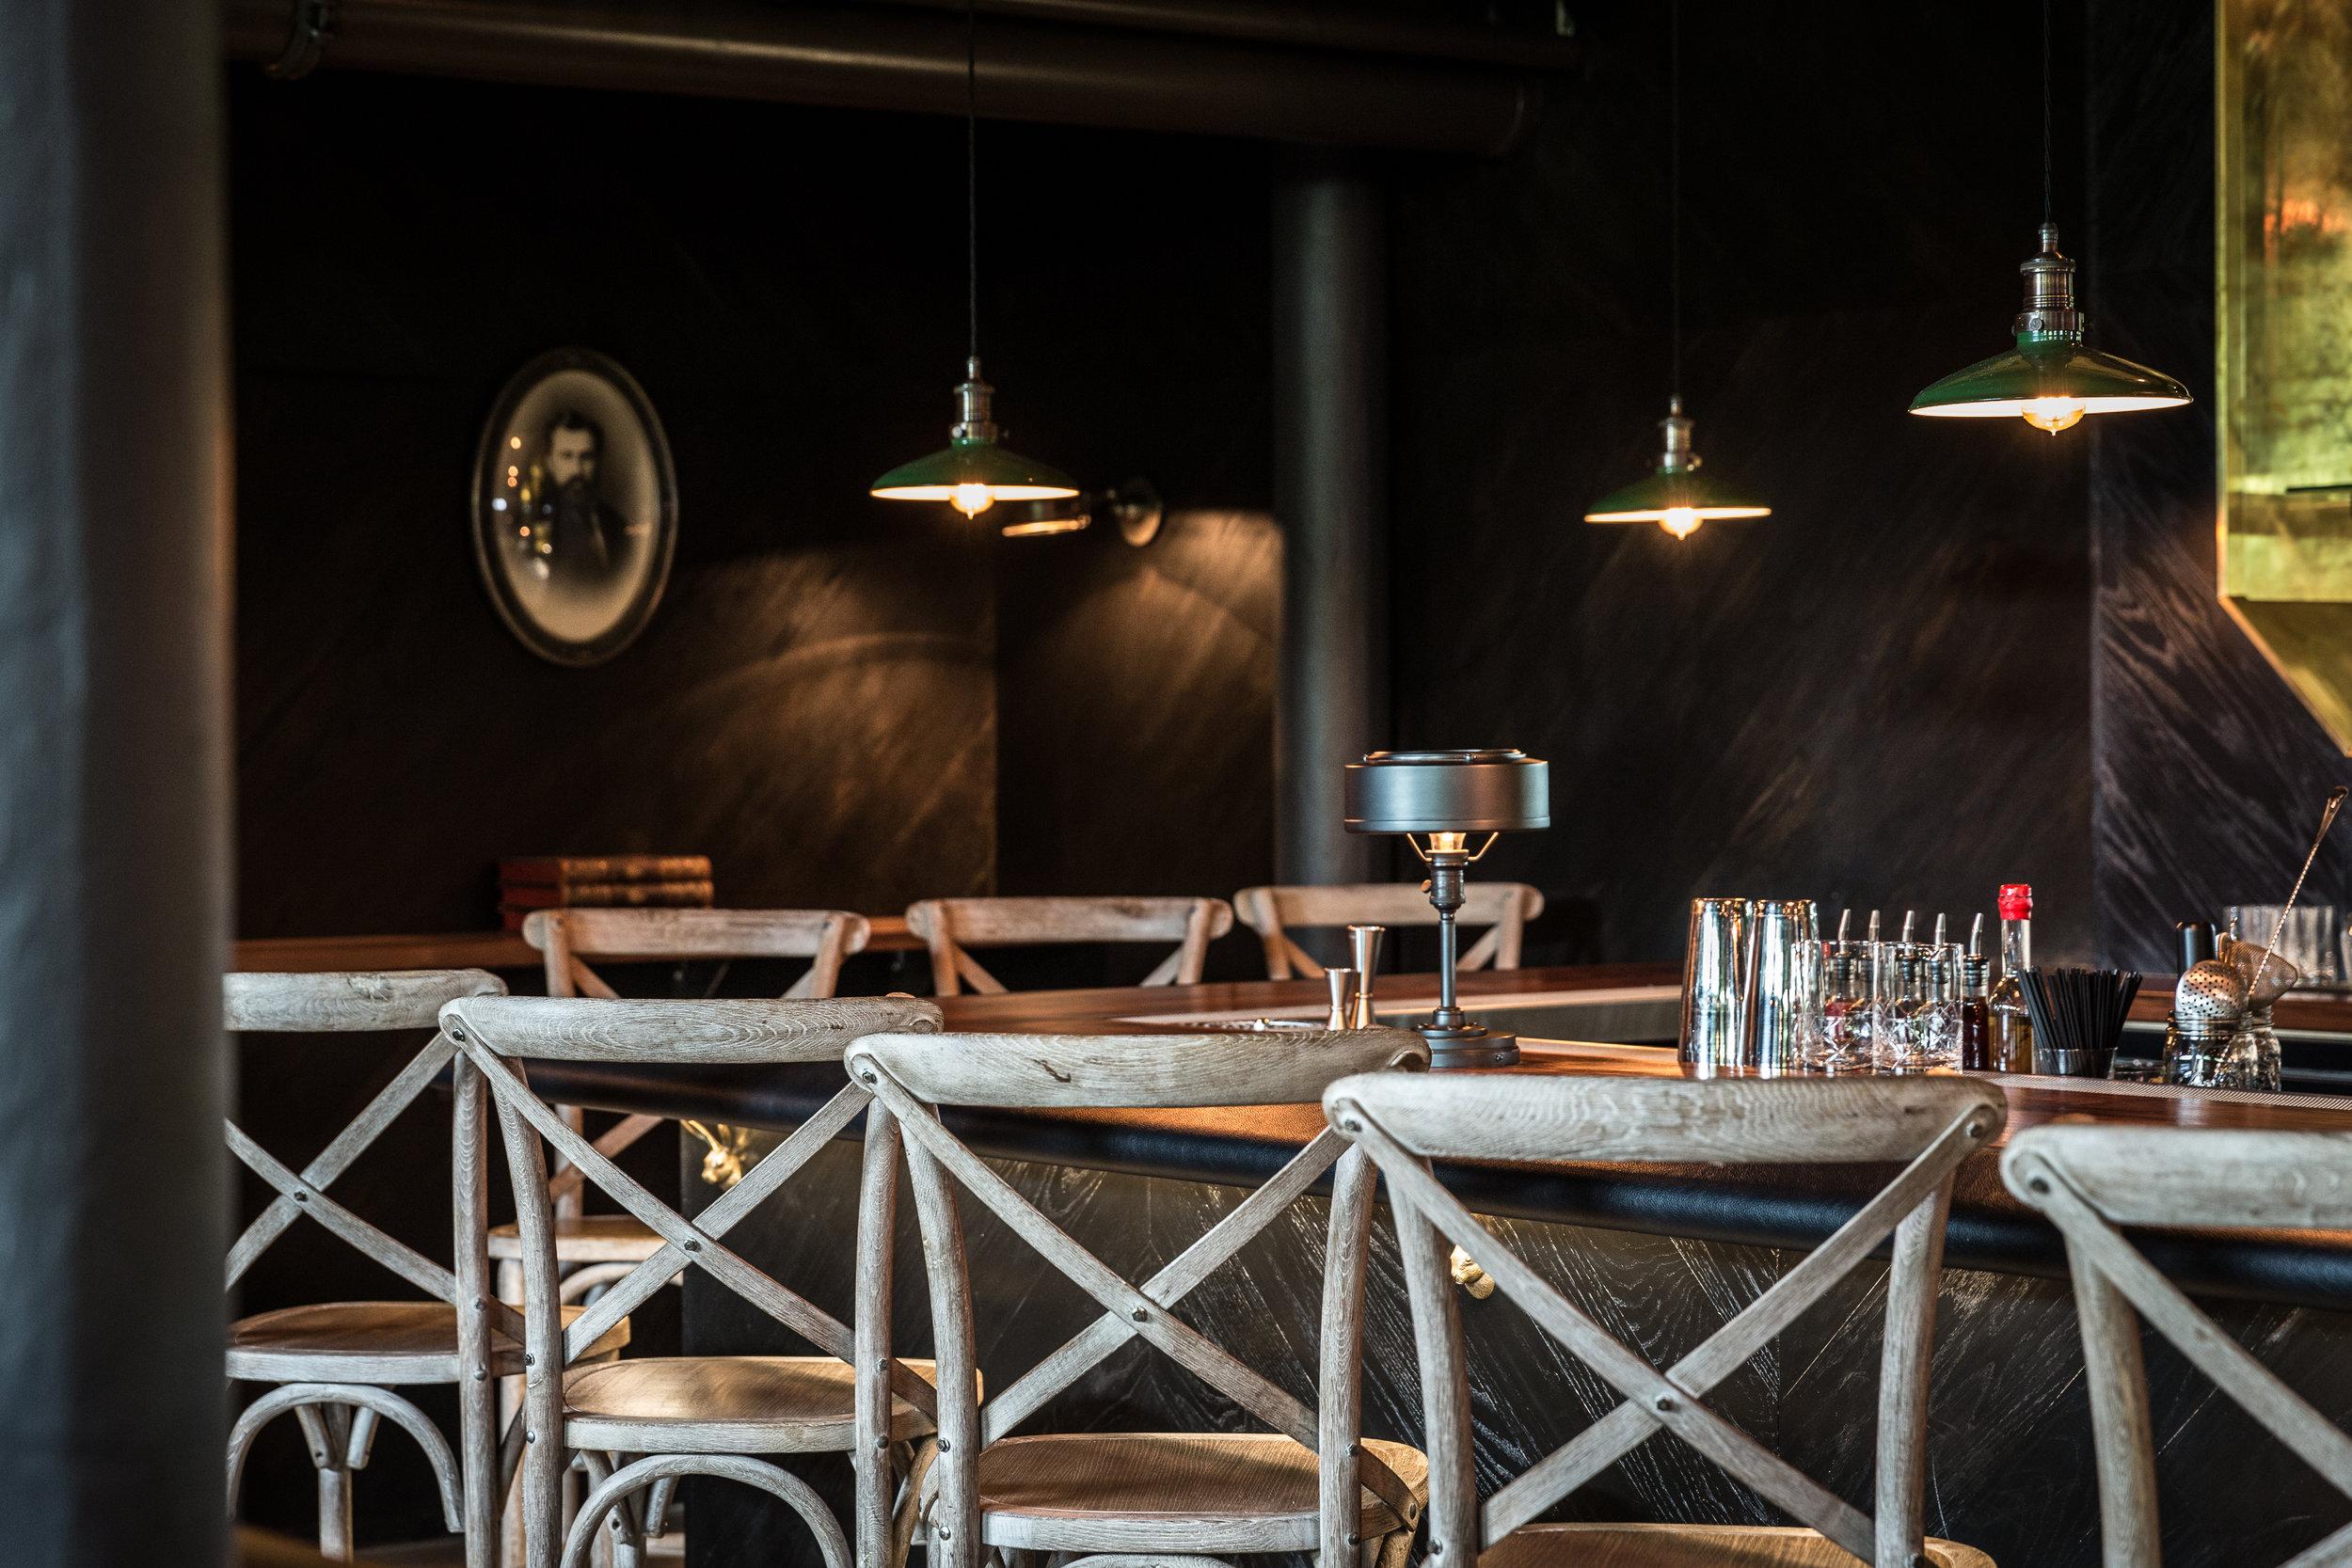 studio-saint-bars-and-restaurants-smyth-and-the-loyalist-washington-dc-18